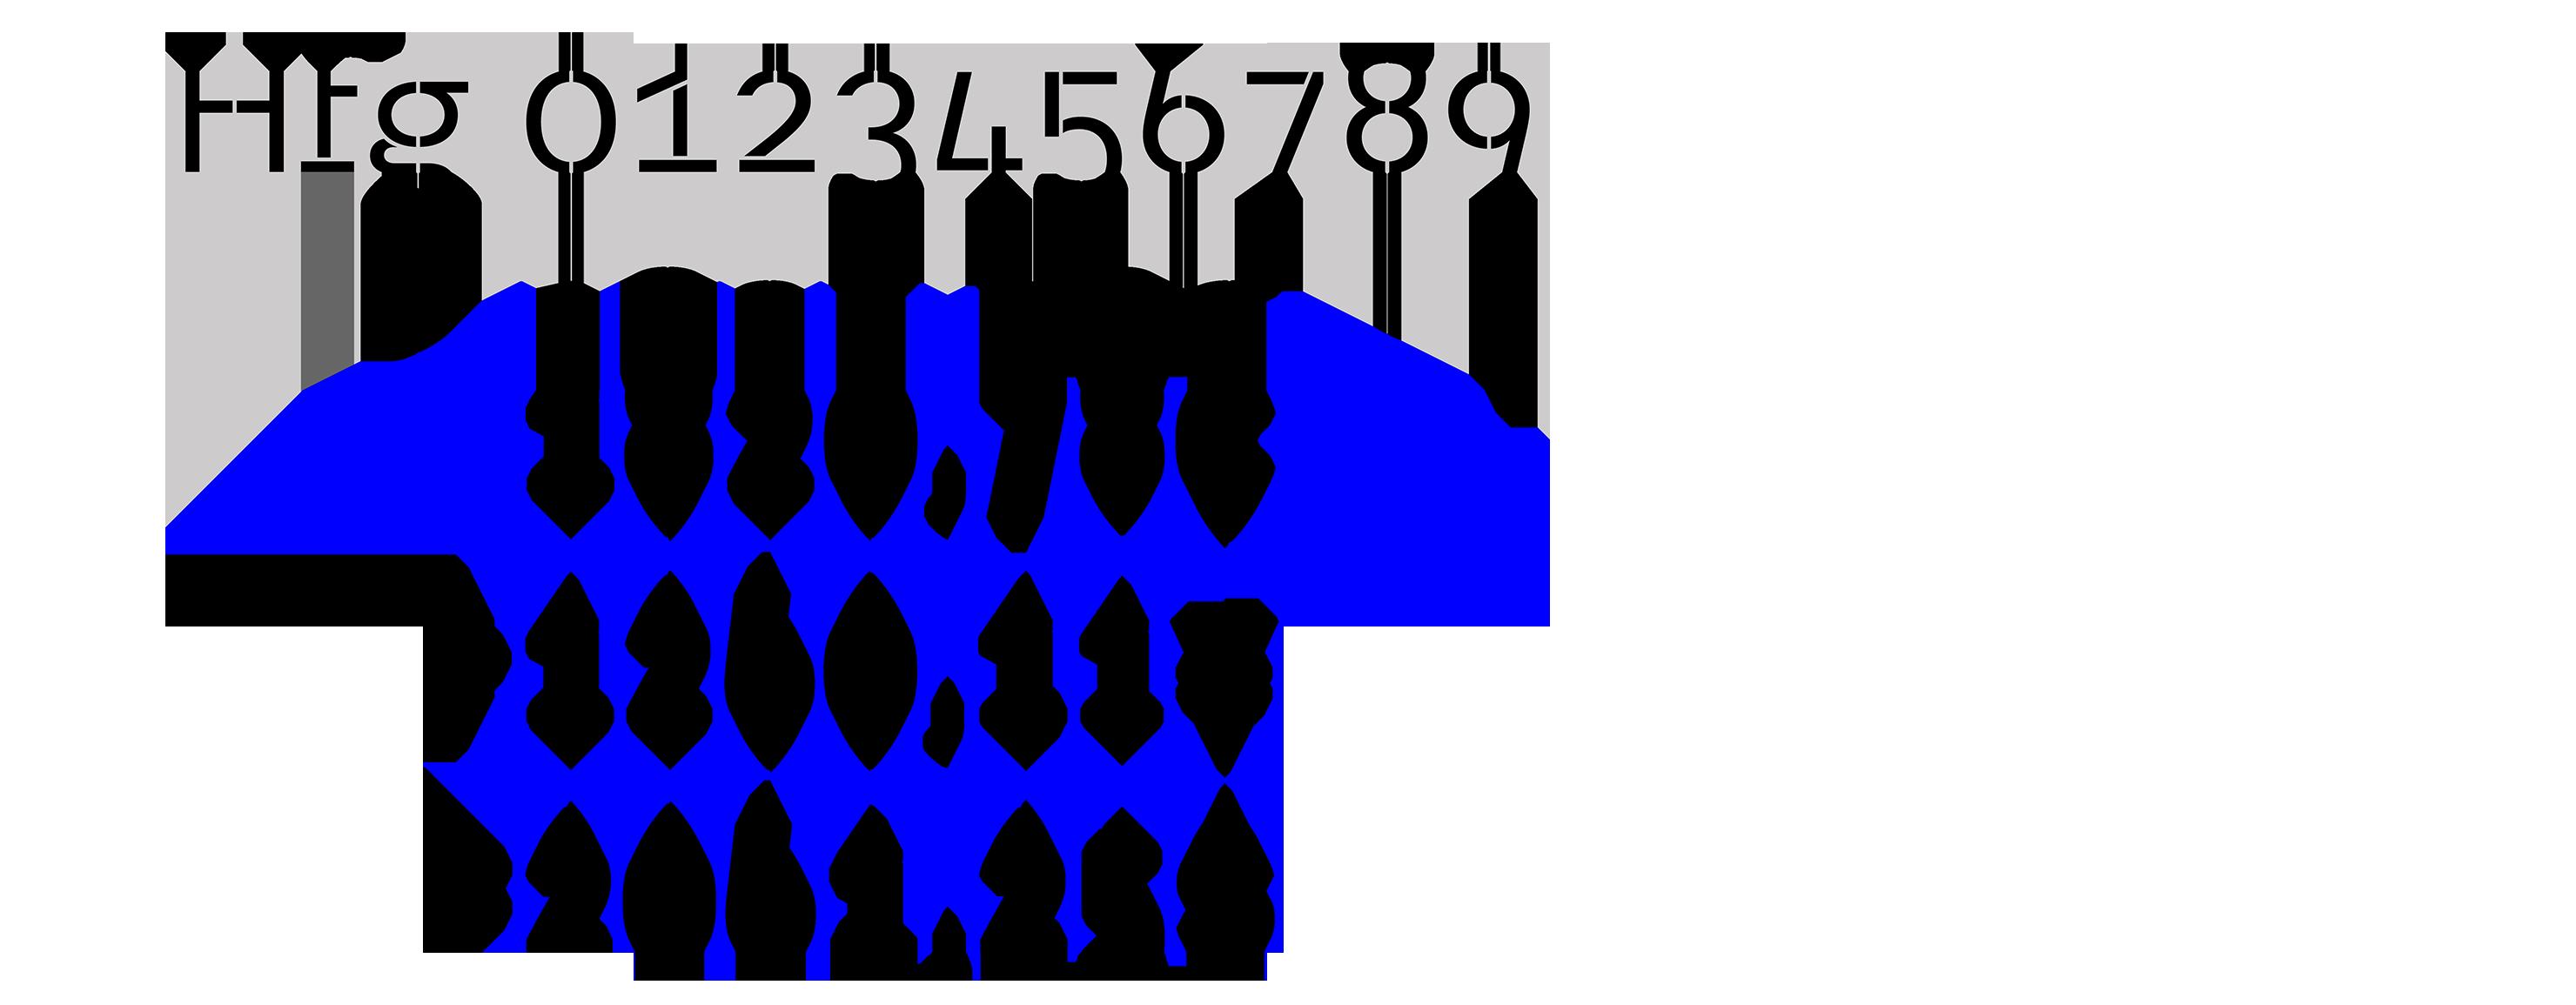 Typeface-Heimat-Stencil-F09-Atlas-Font-Foundry